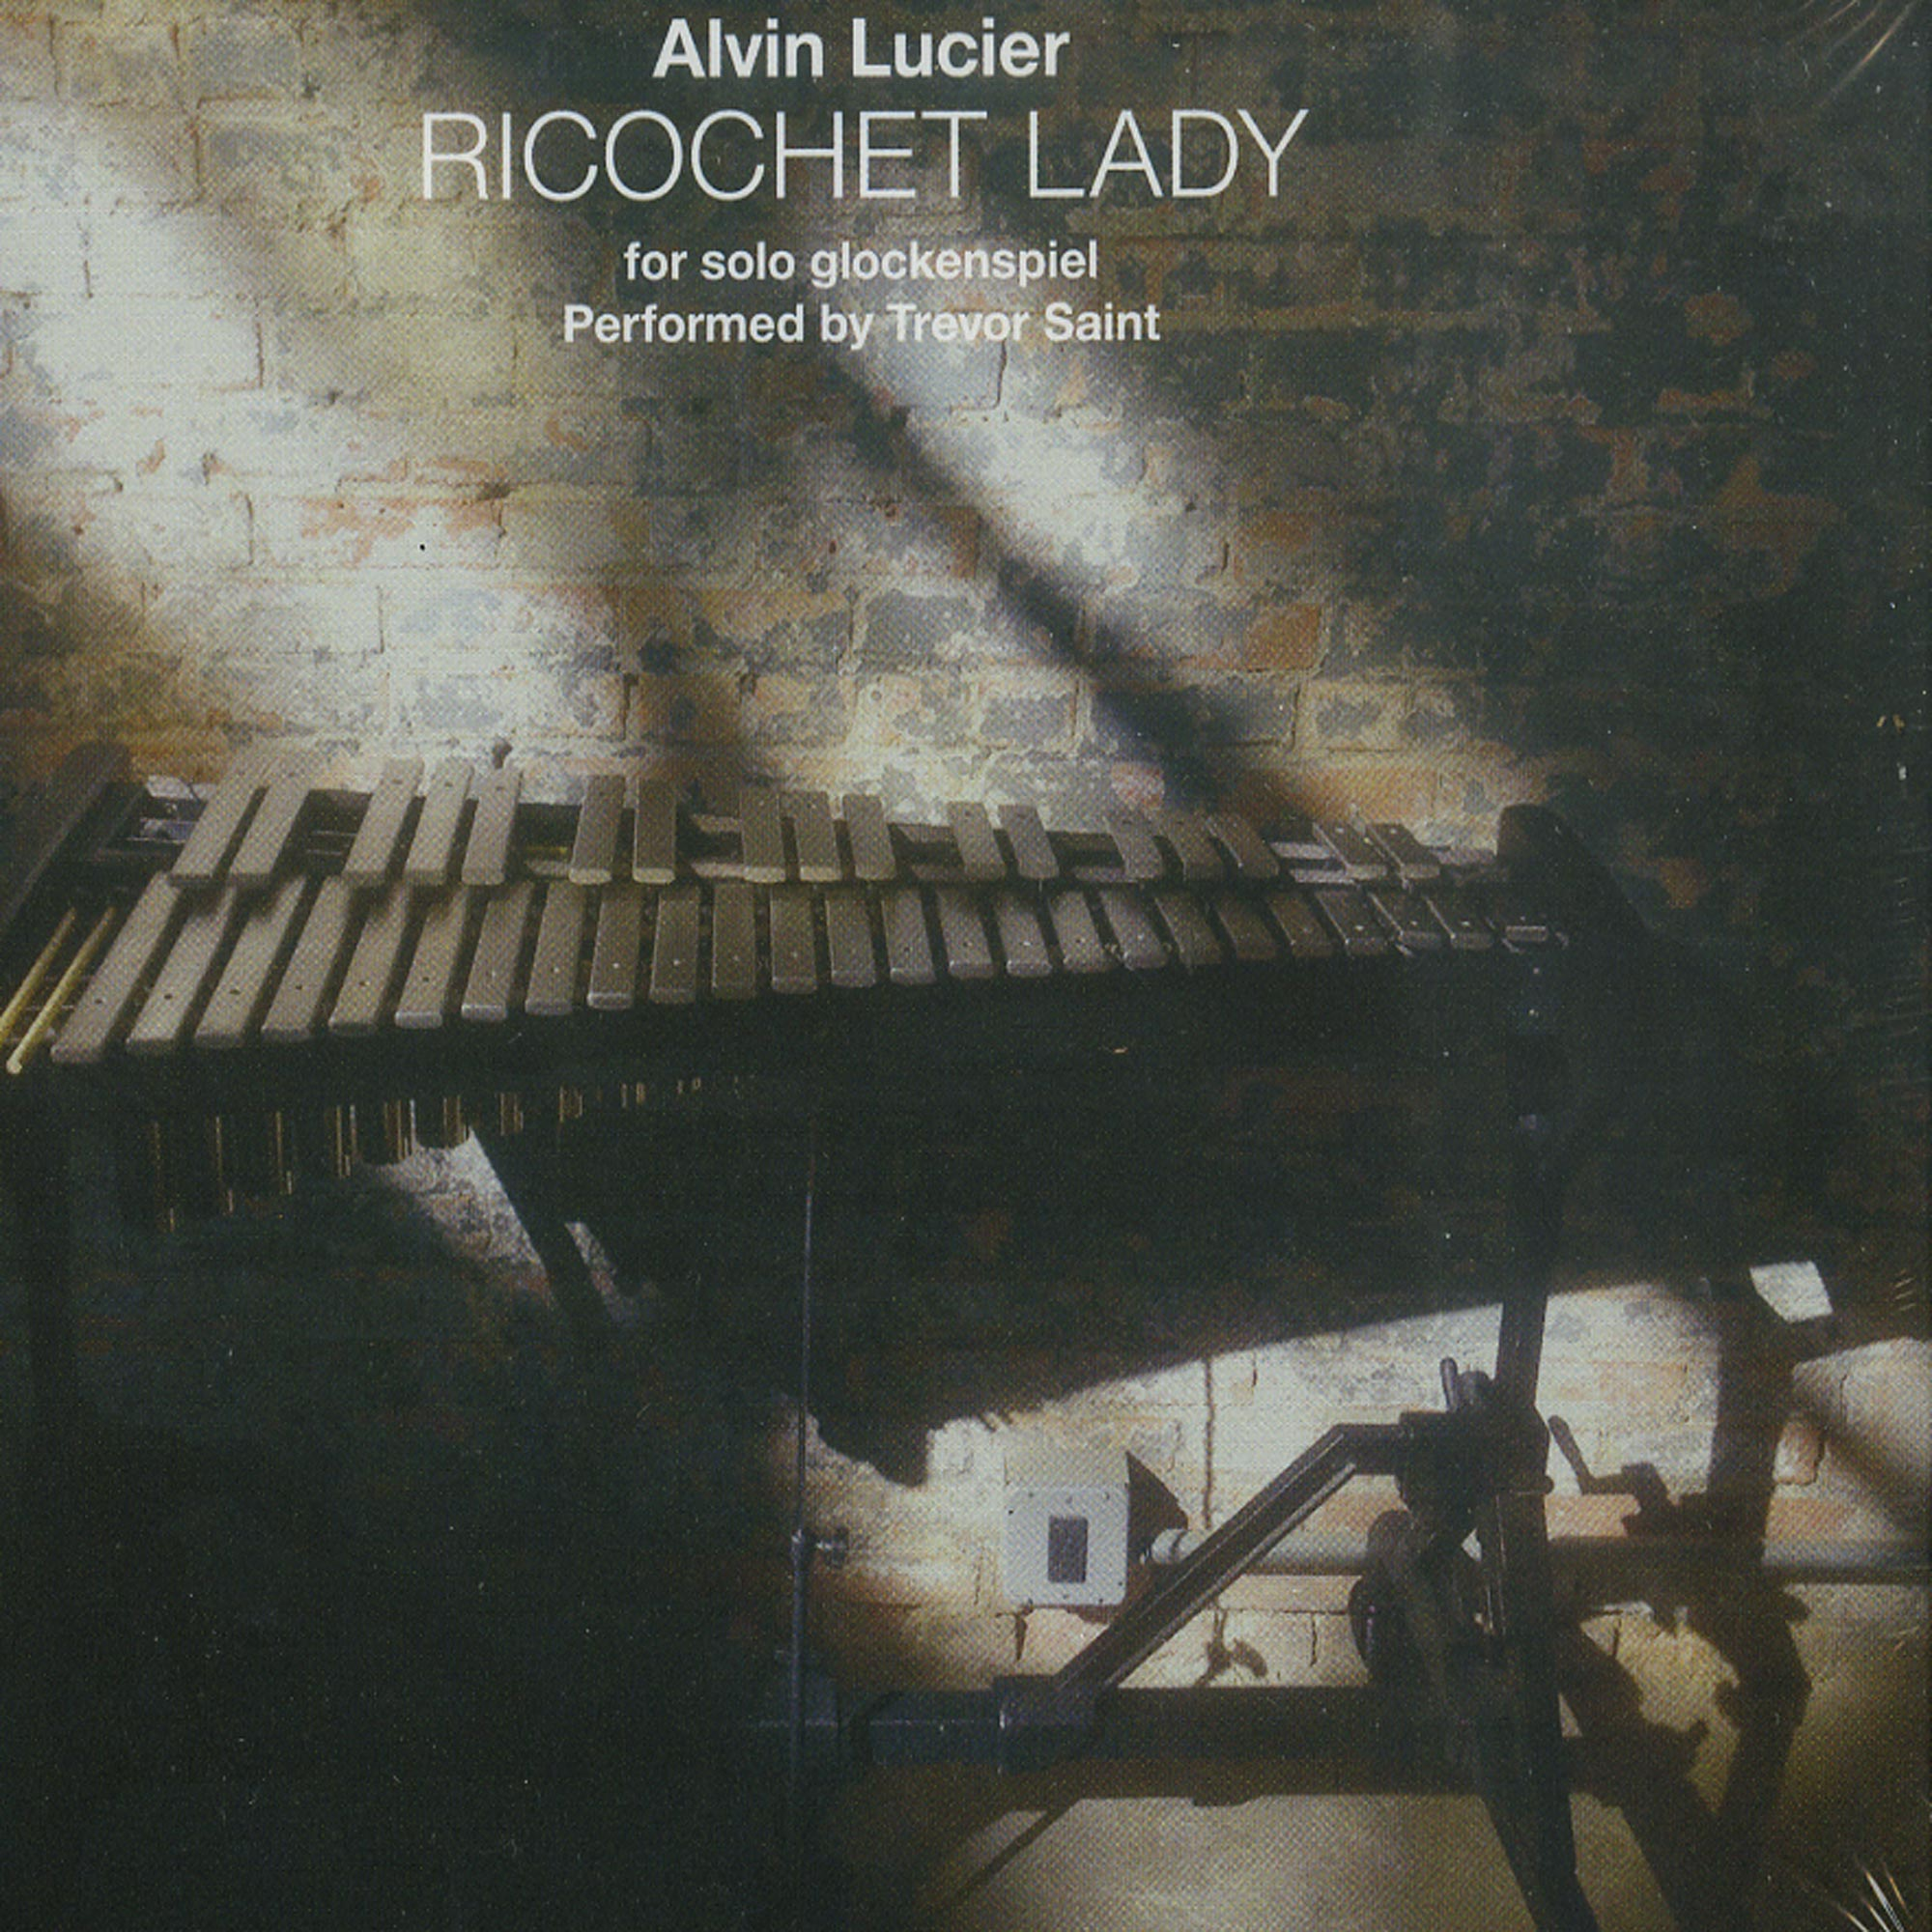 Alvin Lucier - Ricochet Lady